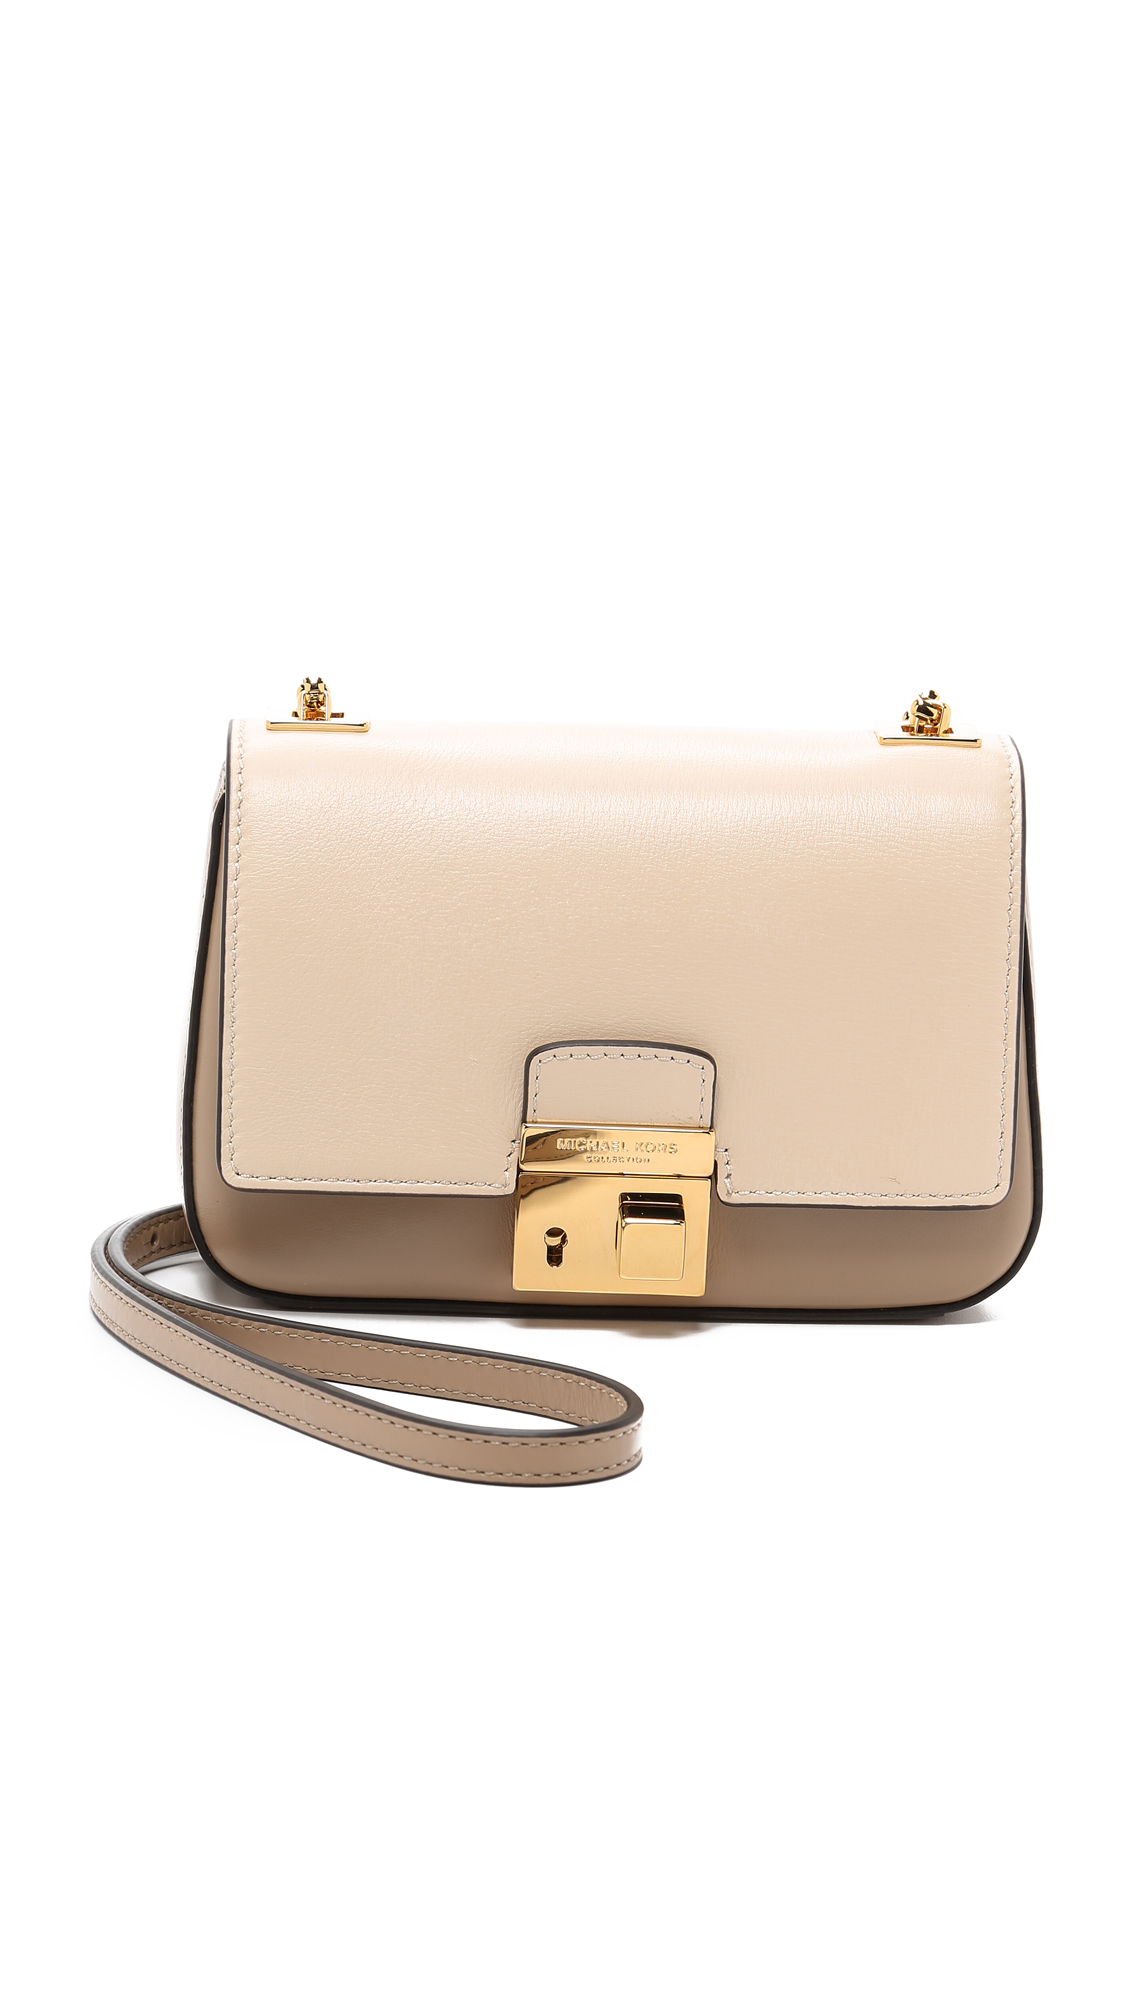 b0ea2c9c661 Michael Kors Gia Small Chain Bag in Natural - Lyst